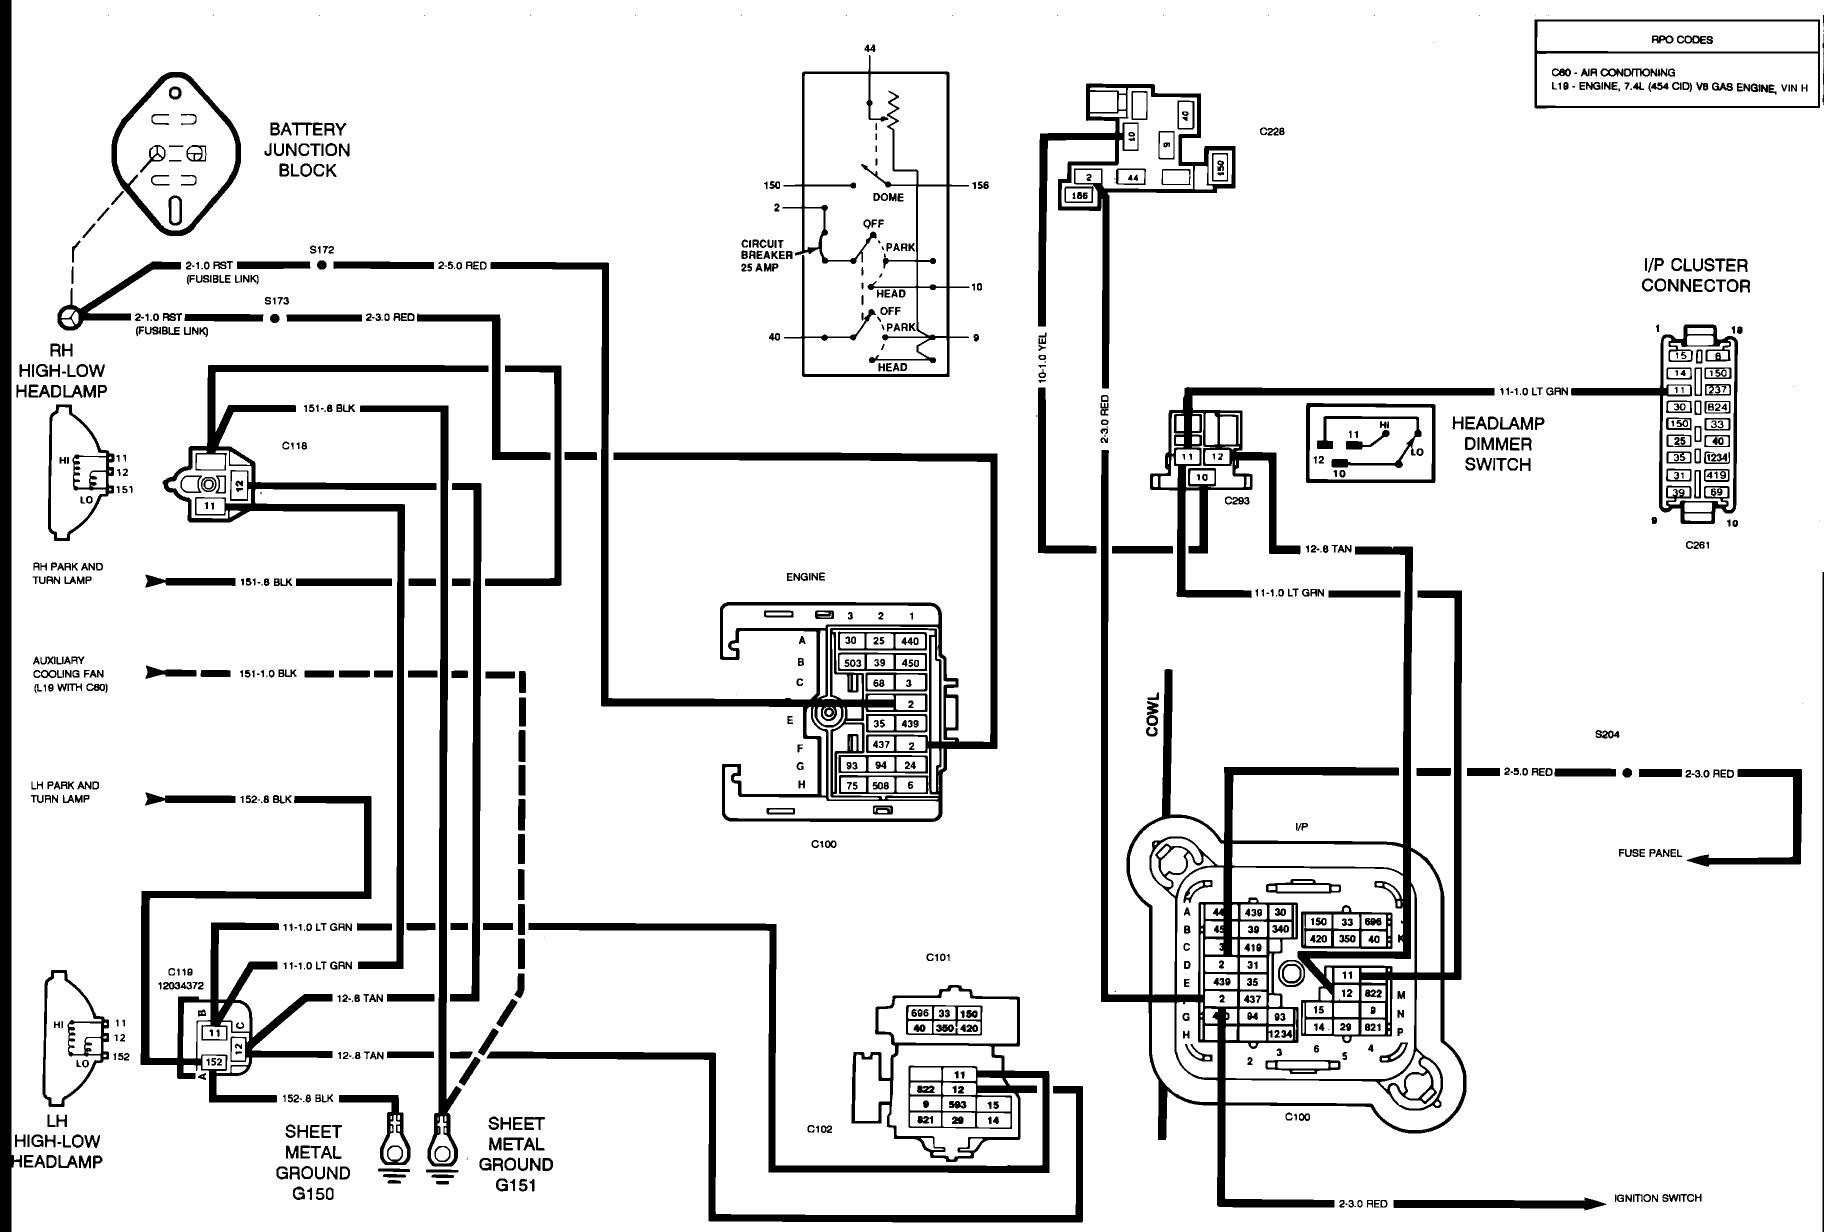 junction box wiring diagram luxury junction box wiring diagram of junction box  wiring diagram